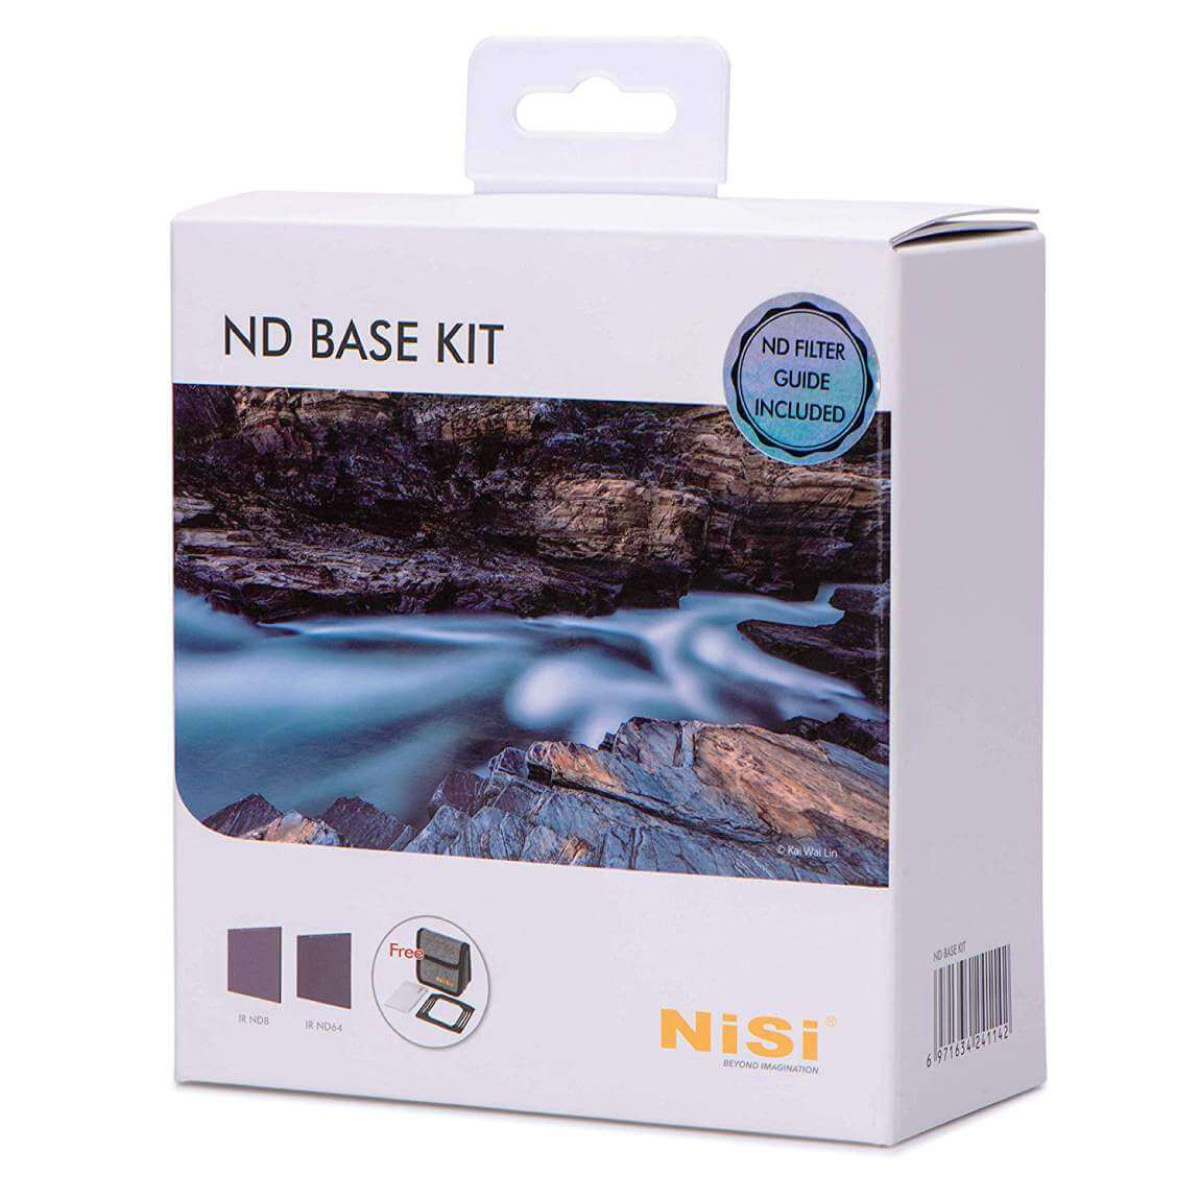 NiSi ND Base Kit 100x100 mm